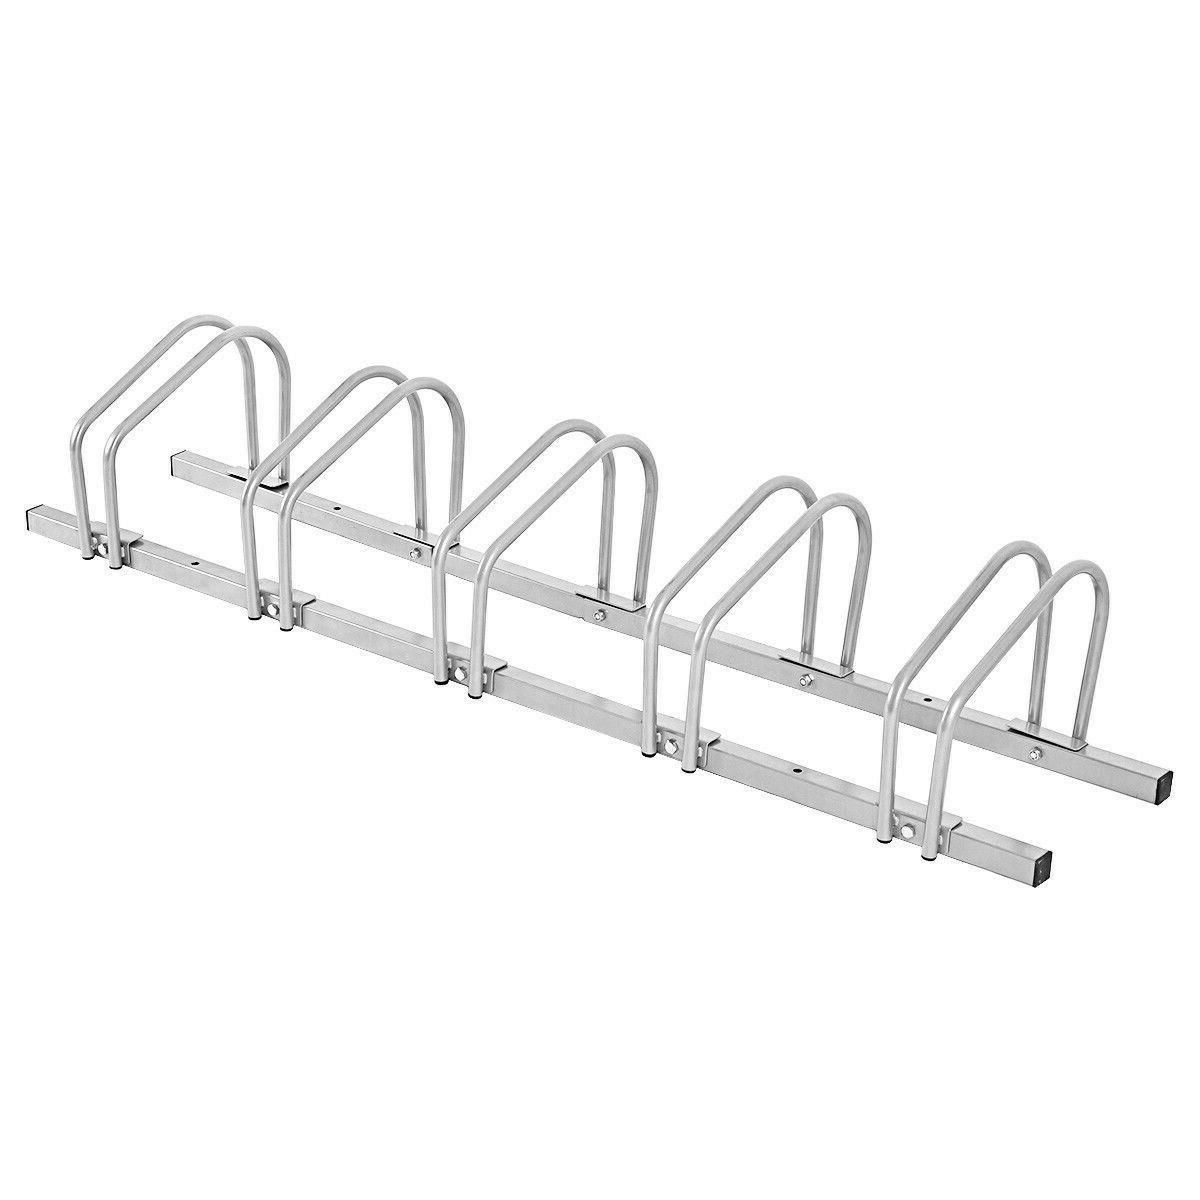 Bike Rack Garage Storage Parking 5 Duty NEW